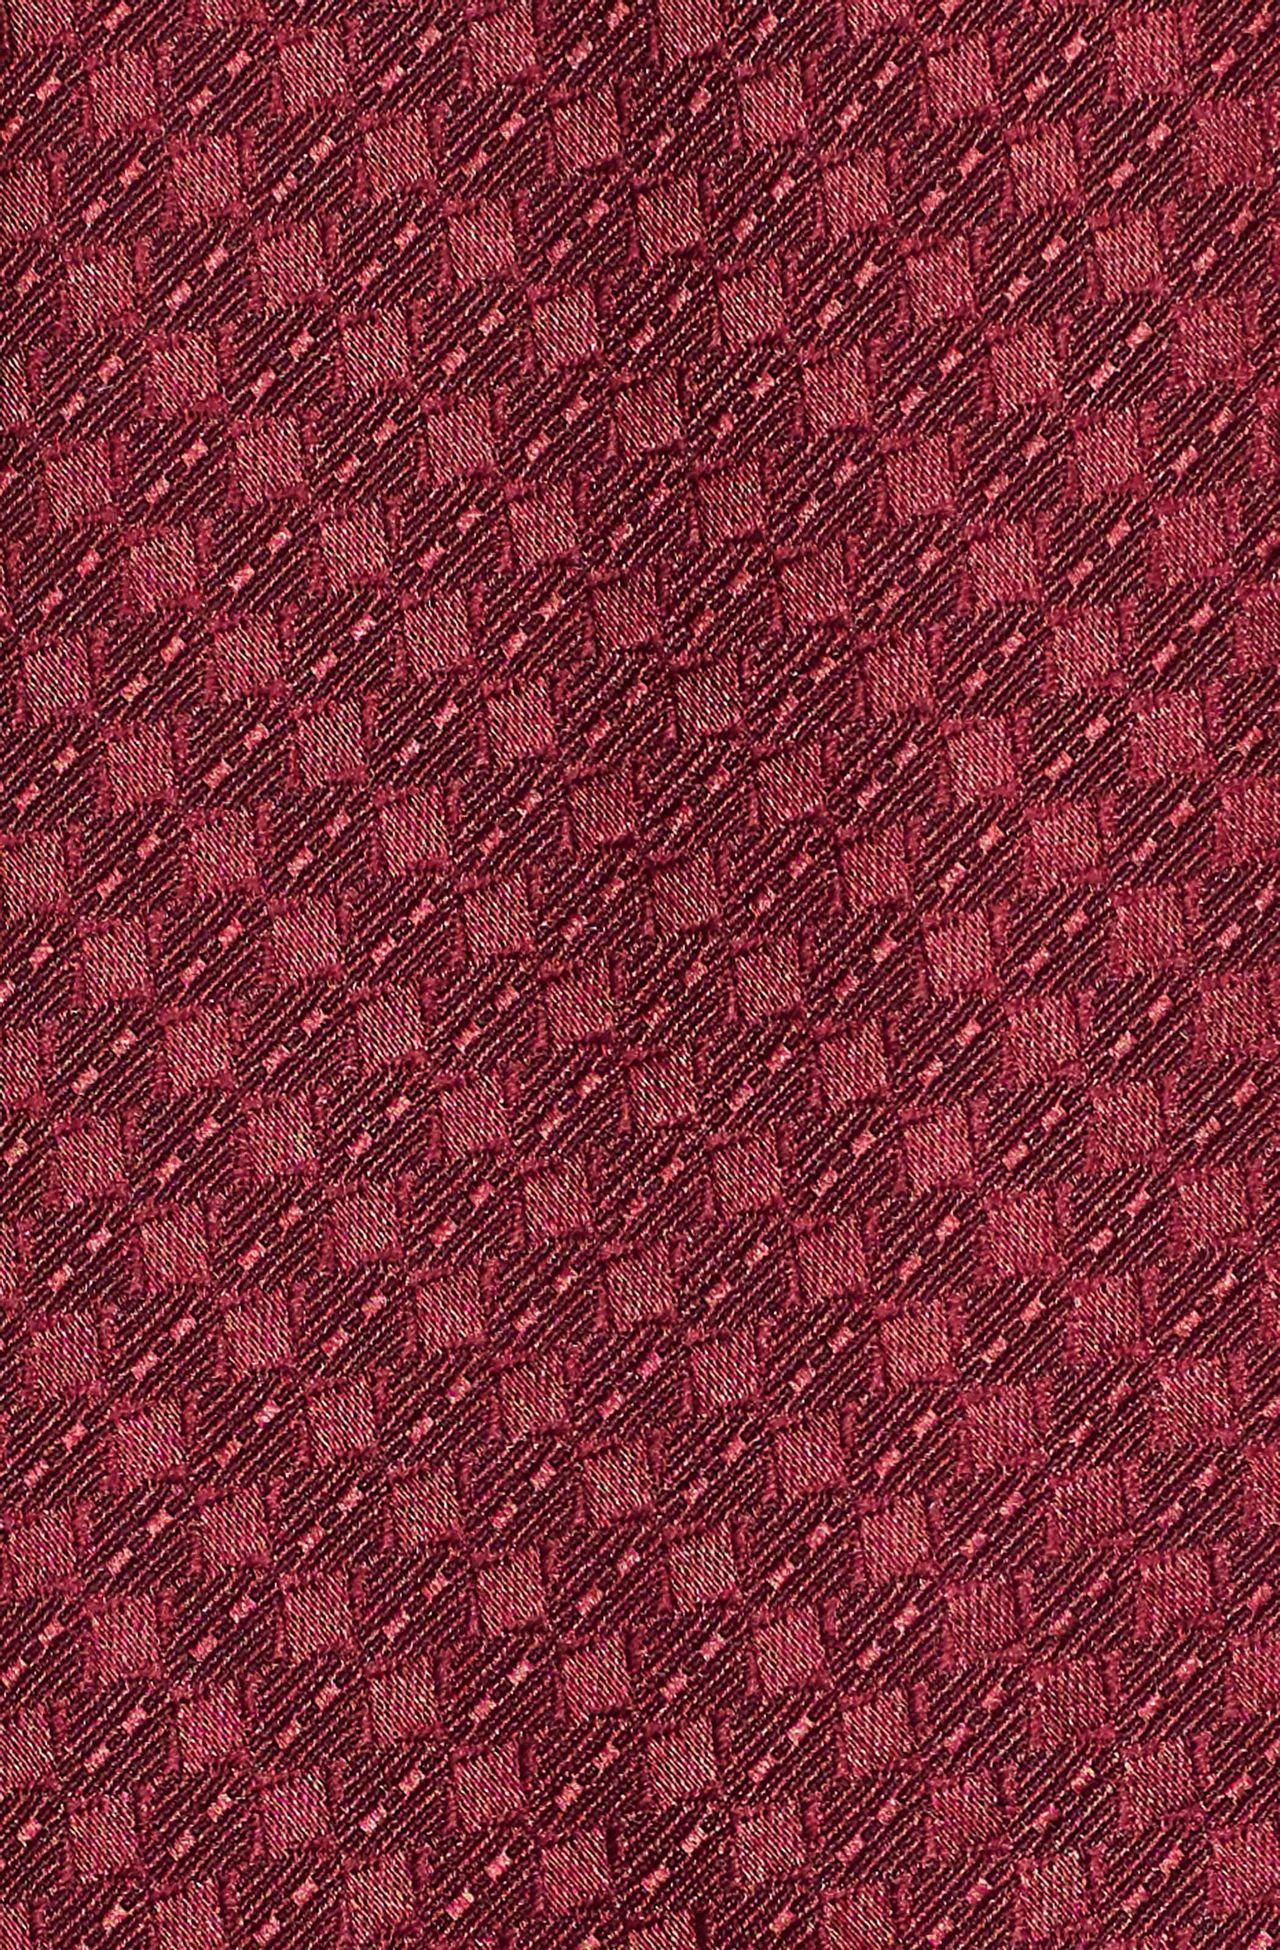 0836NFG00007_399_3-GRAVATA-REGULAR-MICROFIBRA